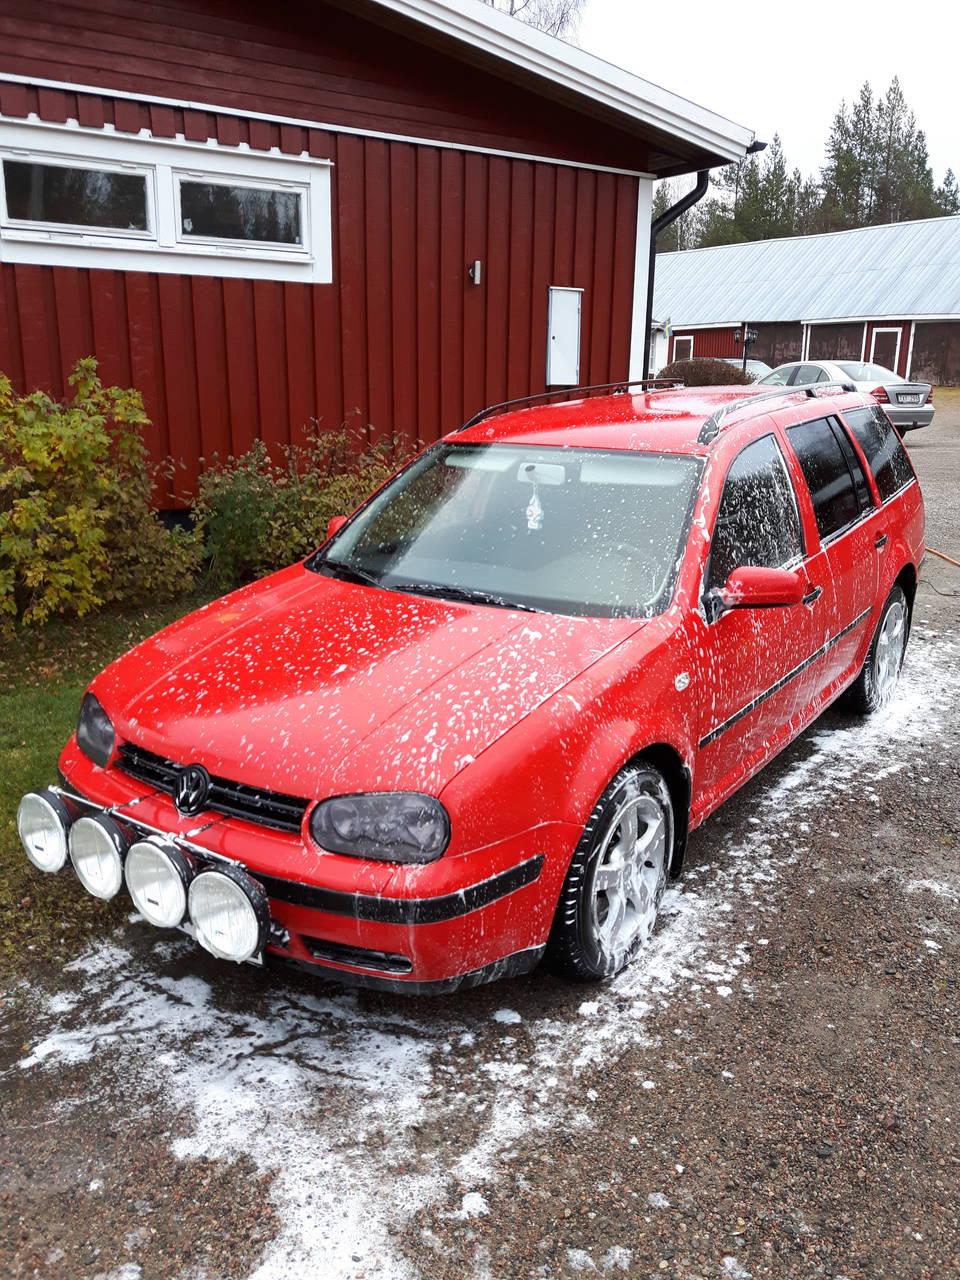 Garaget volkswagen golf 1 9tdi iv variant 2000 for Garage volkswagen rueil malmaison 92